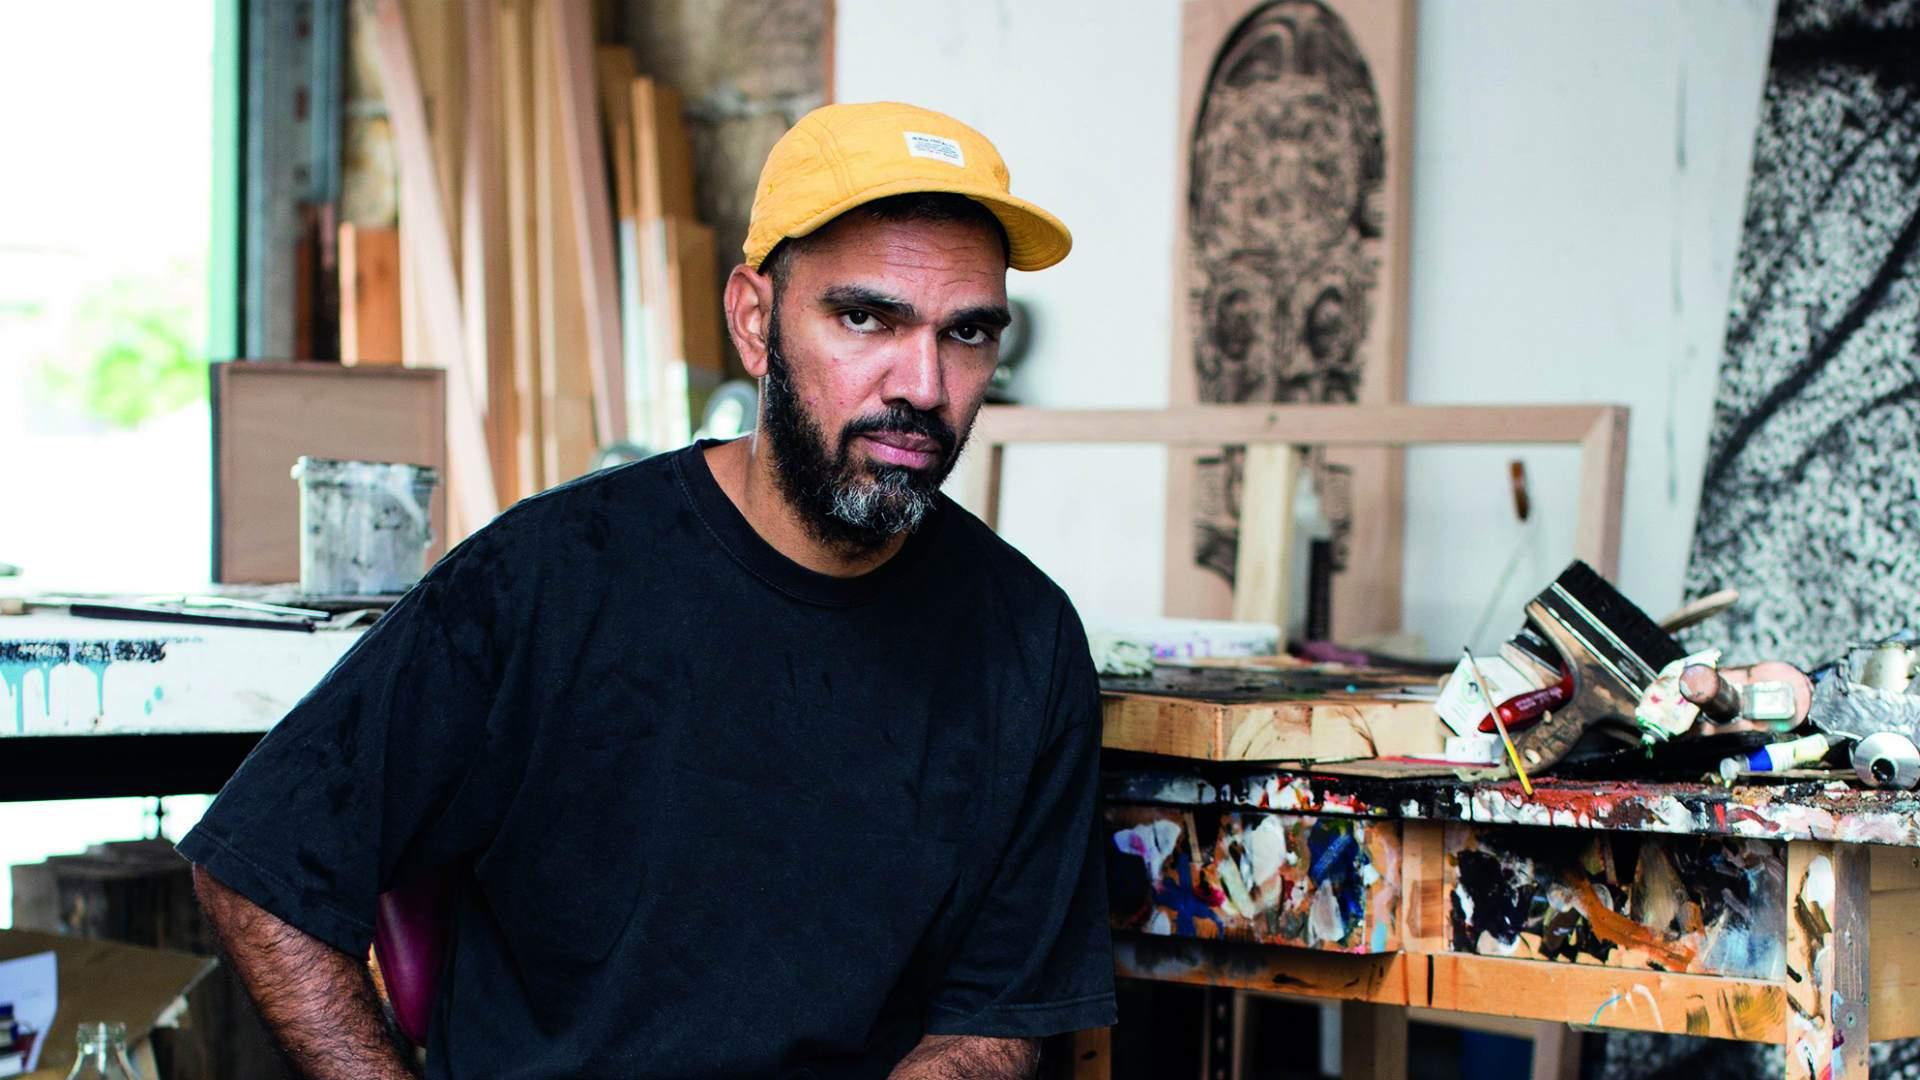 Defying Empire: NGA's 3rd National Indigenous Art Triennial